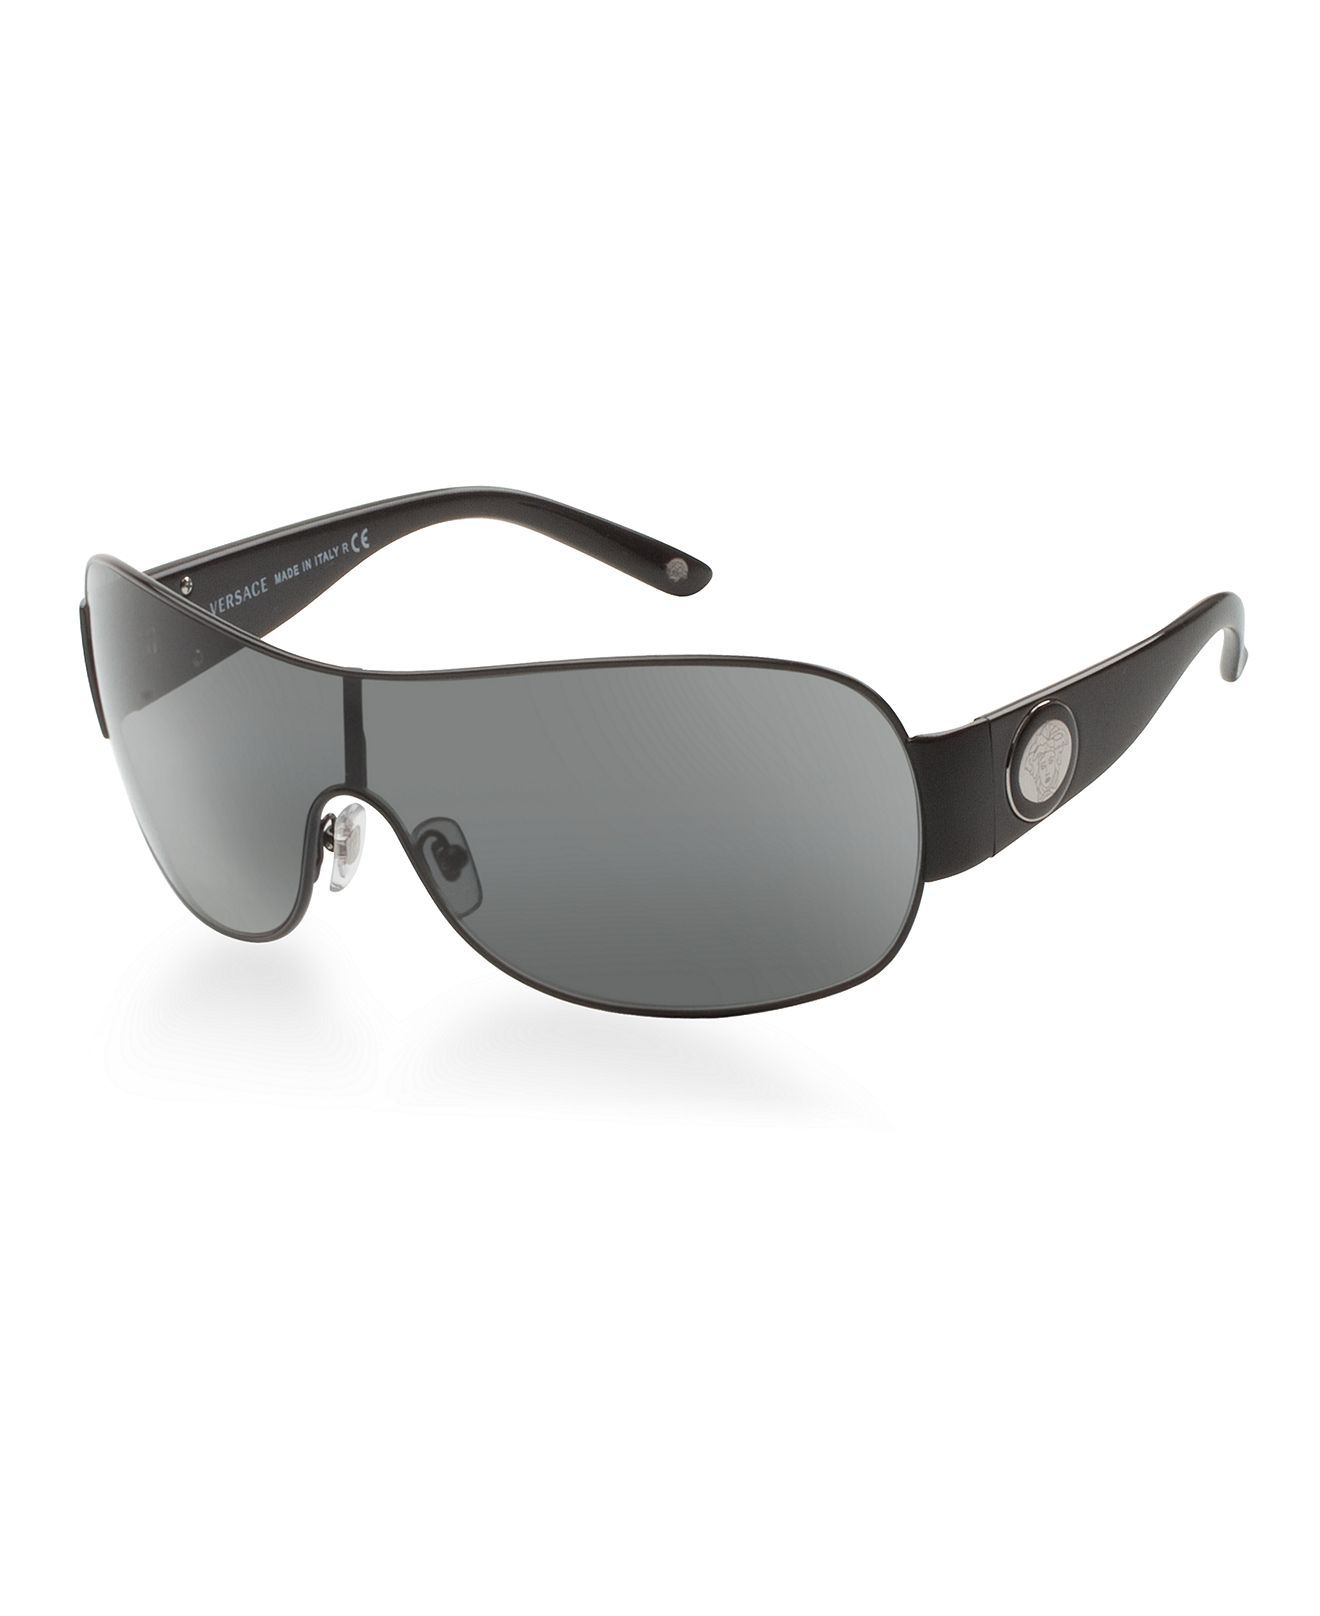 26a269cb05 Versace Sunglasses